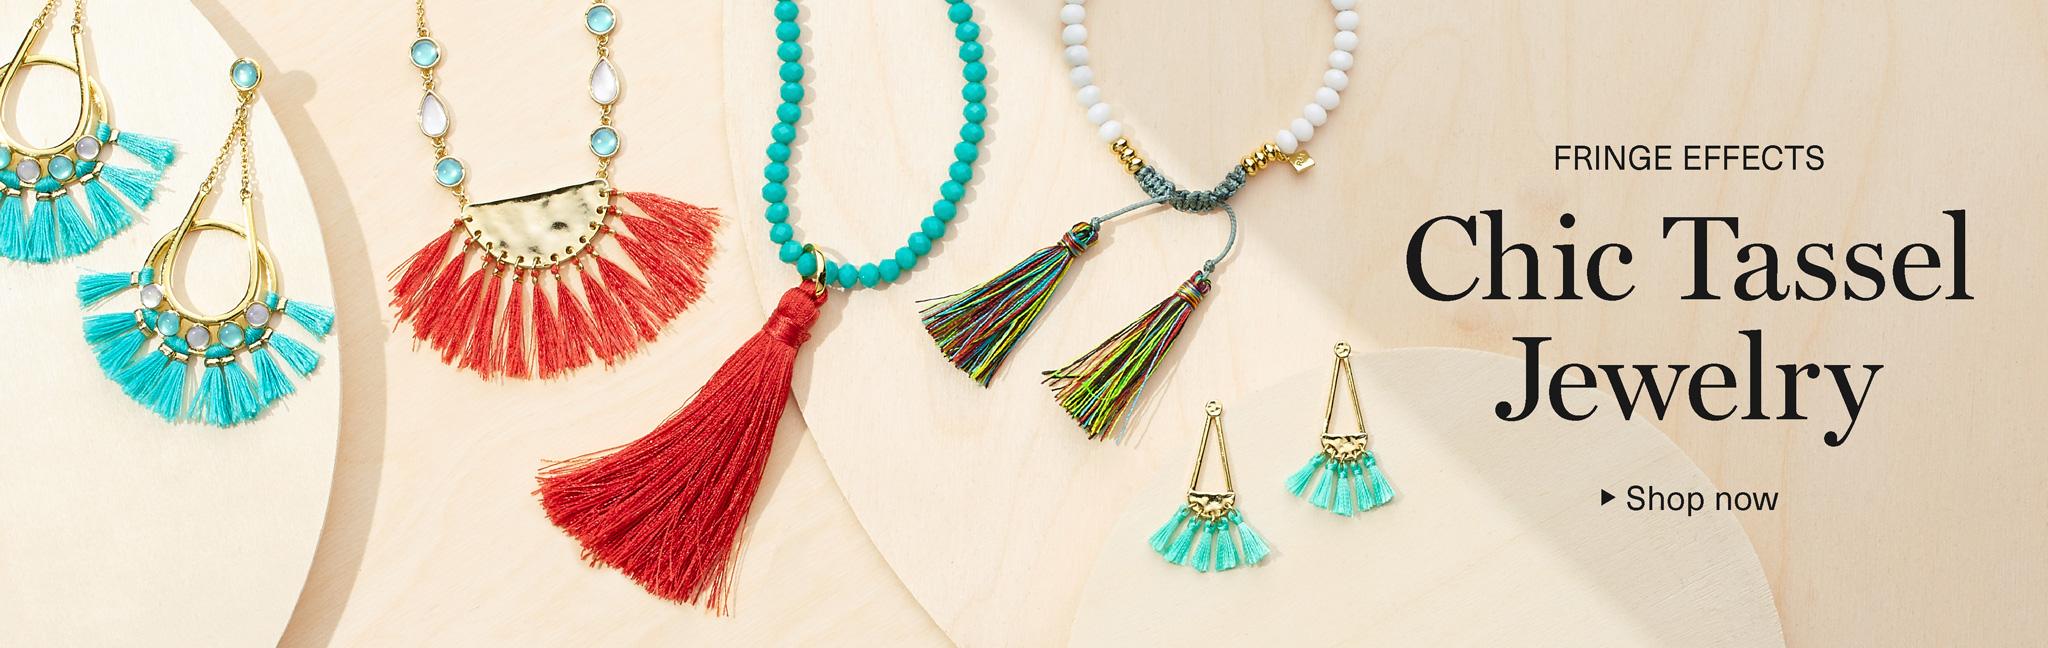 fashion jewelry. chic tassel jewelry YBFIMUD